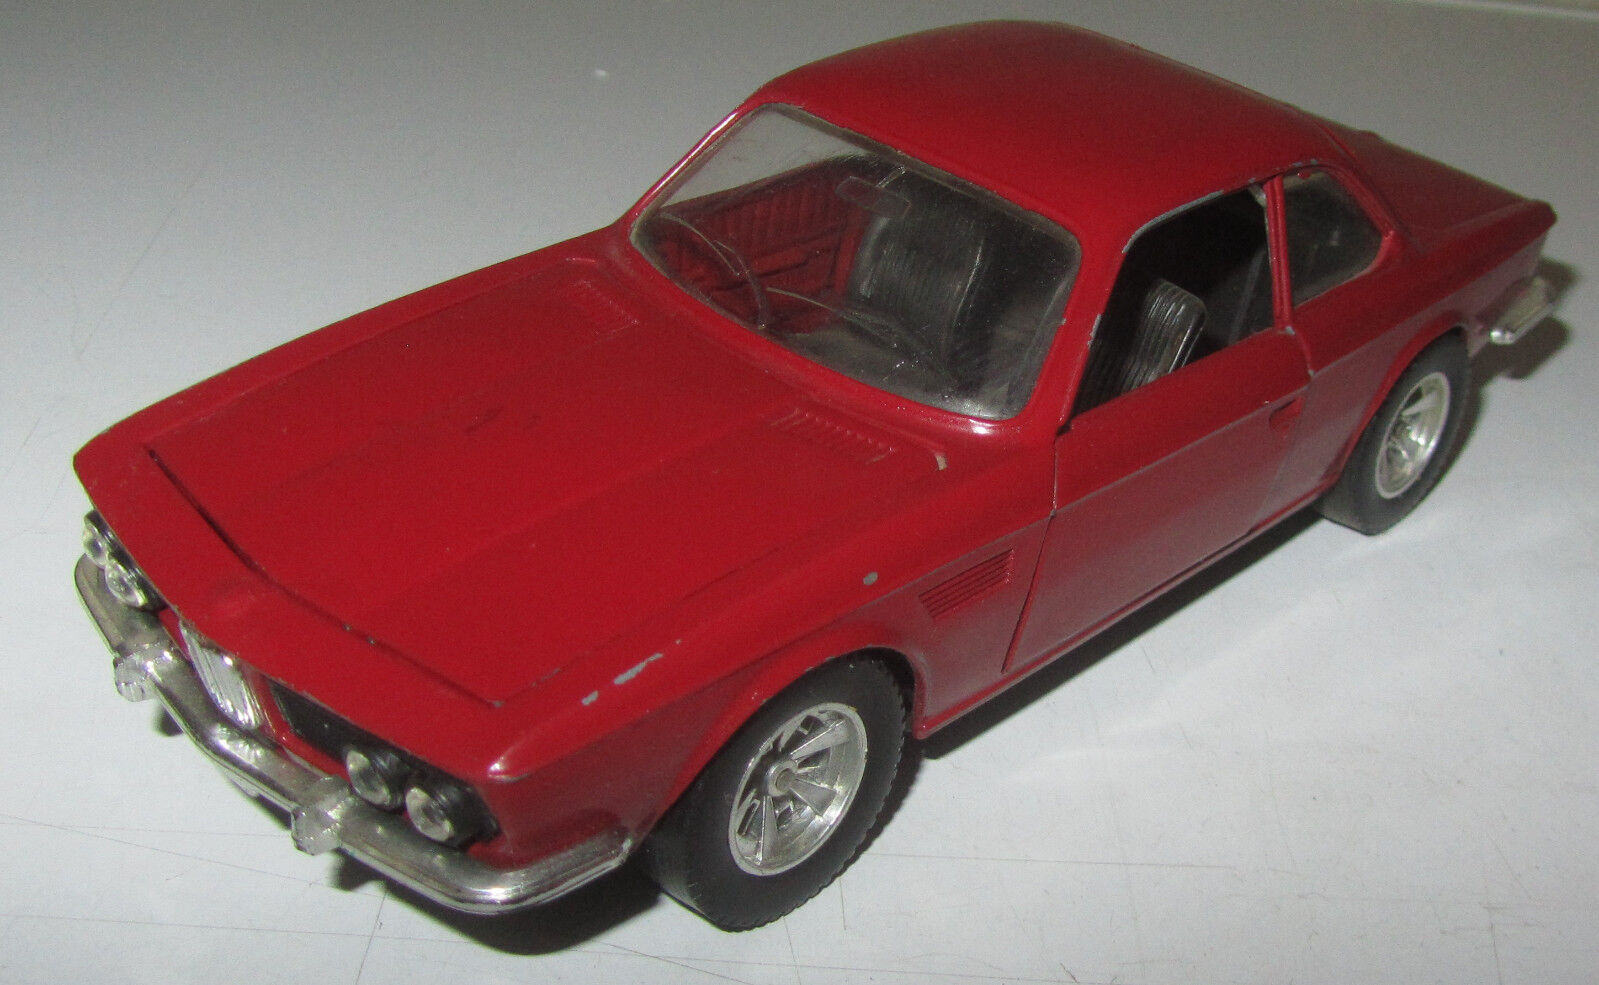 Modellino Bburago Martoys 1 24 bmw 3.0 cs 0110 0110 0110 RARA 88c91d